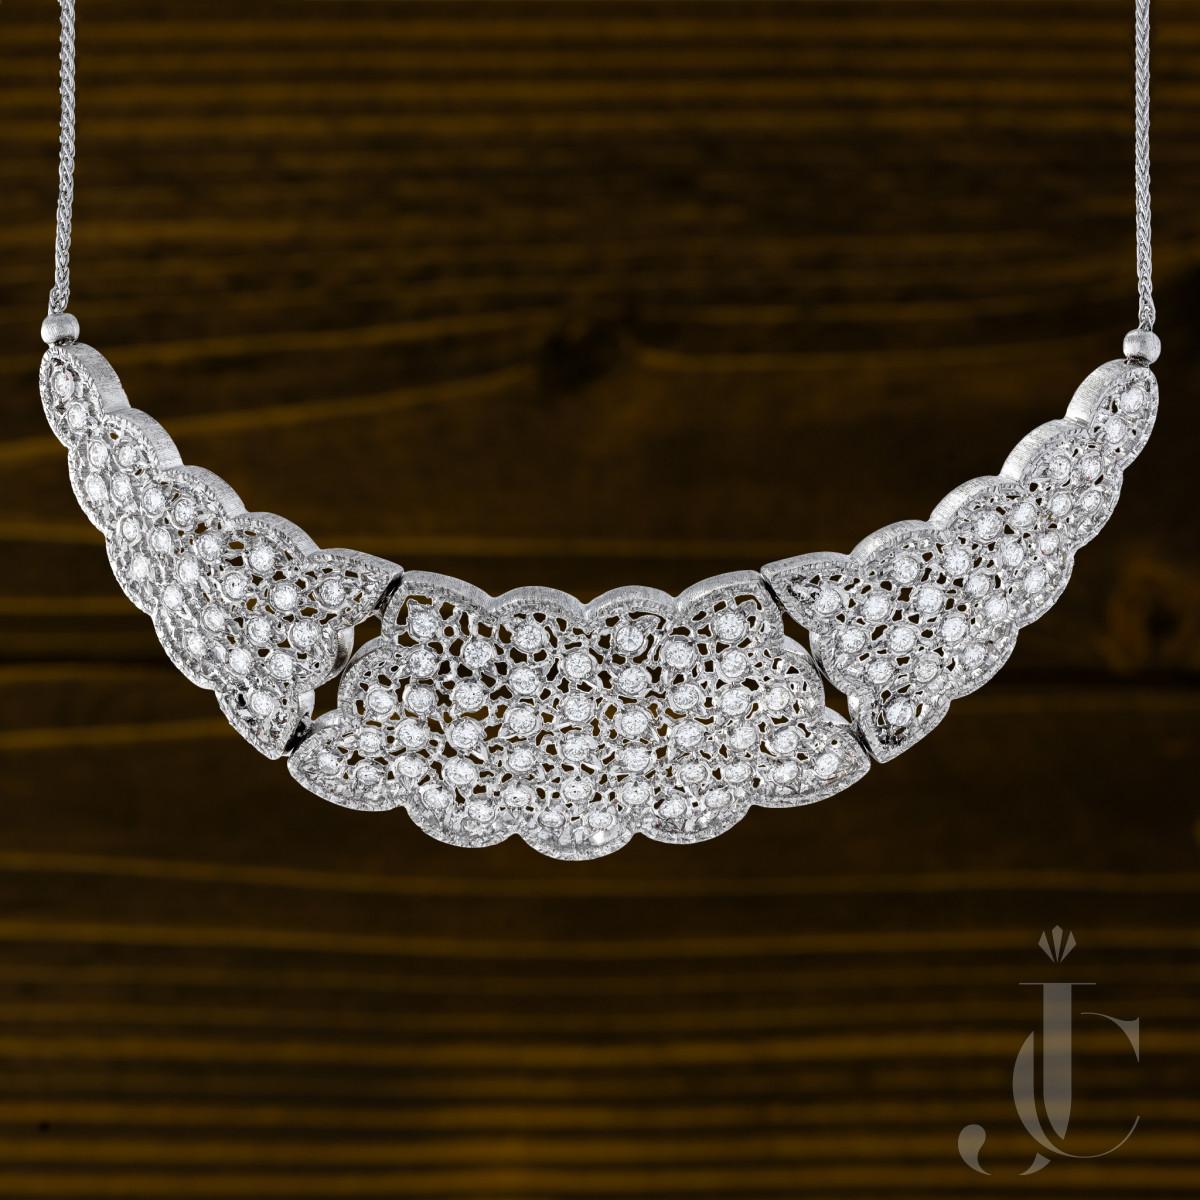 M Buccellati Diamond Necklace, Italy